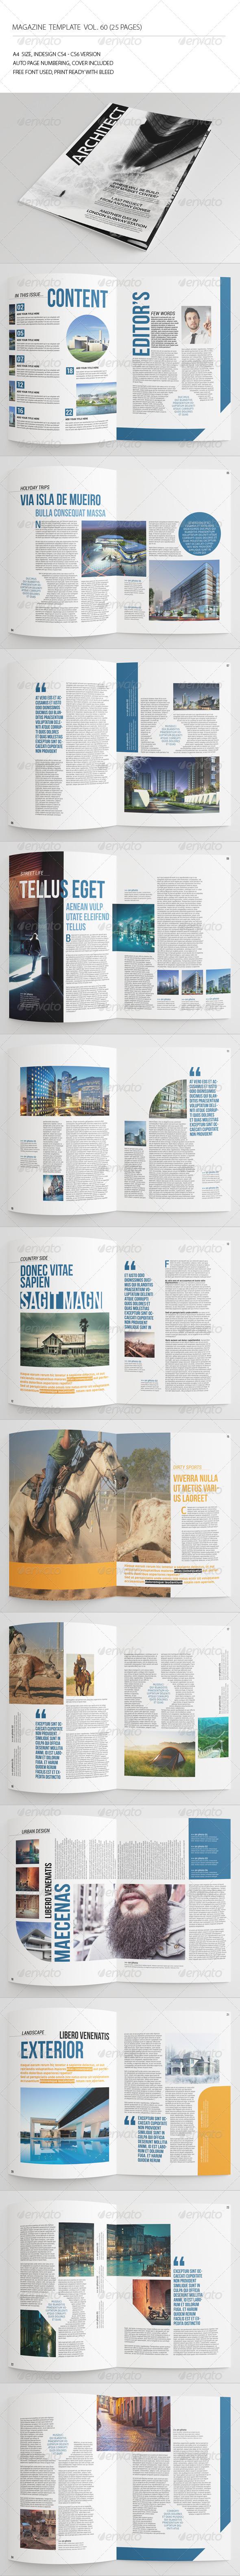 GraphicRiver 25 Pages Architecture Magazine Vol60 7845872